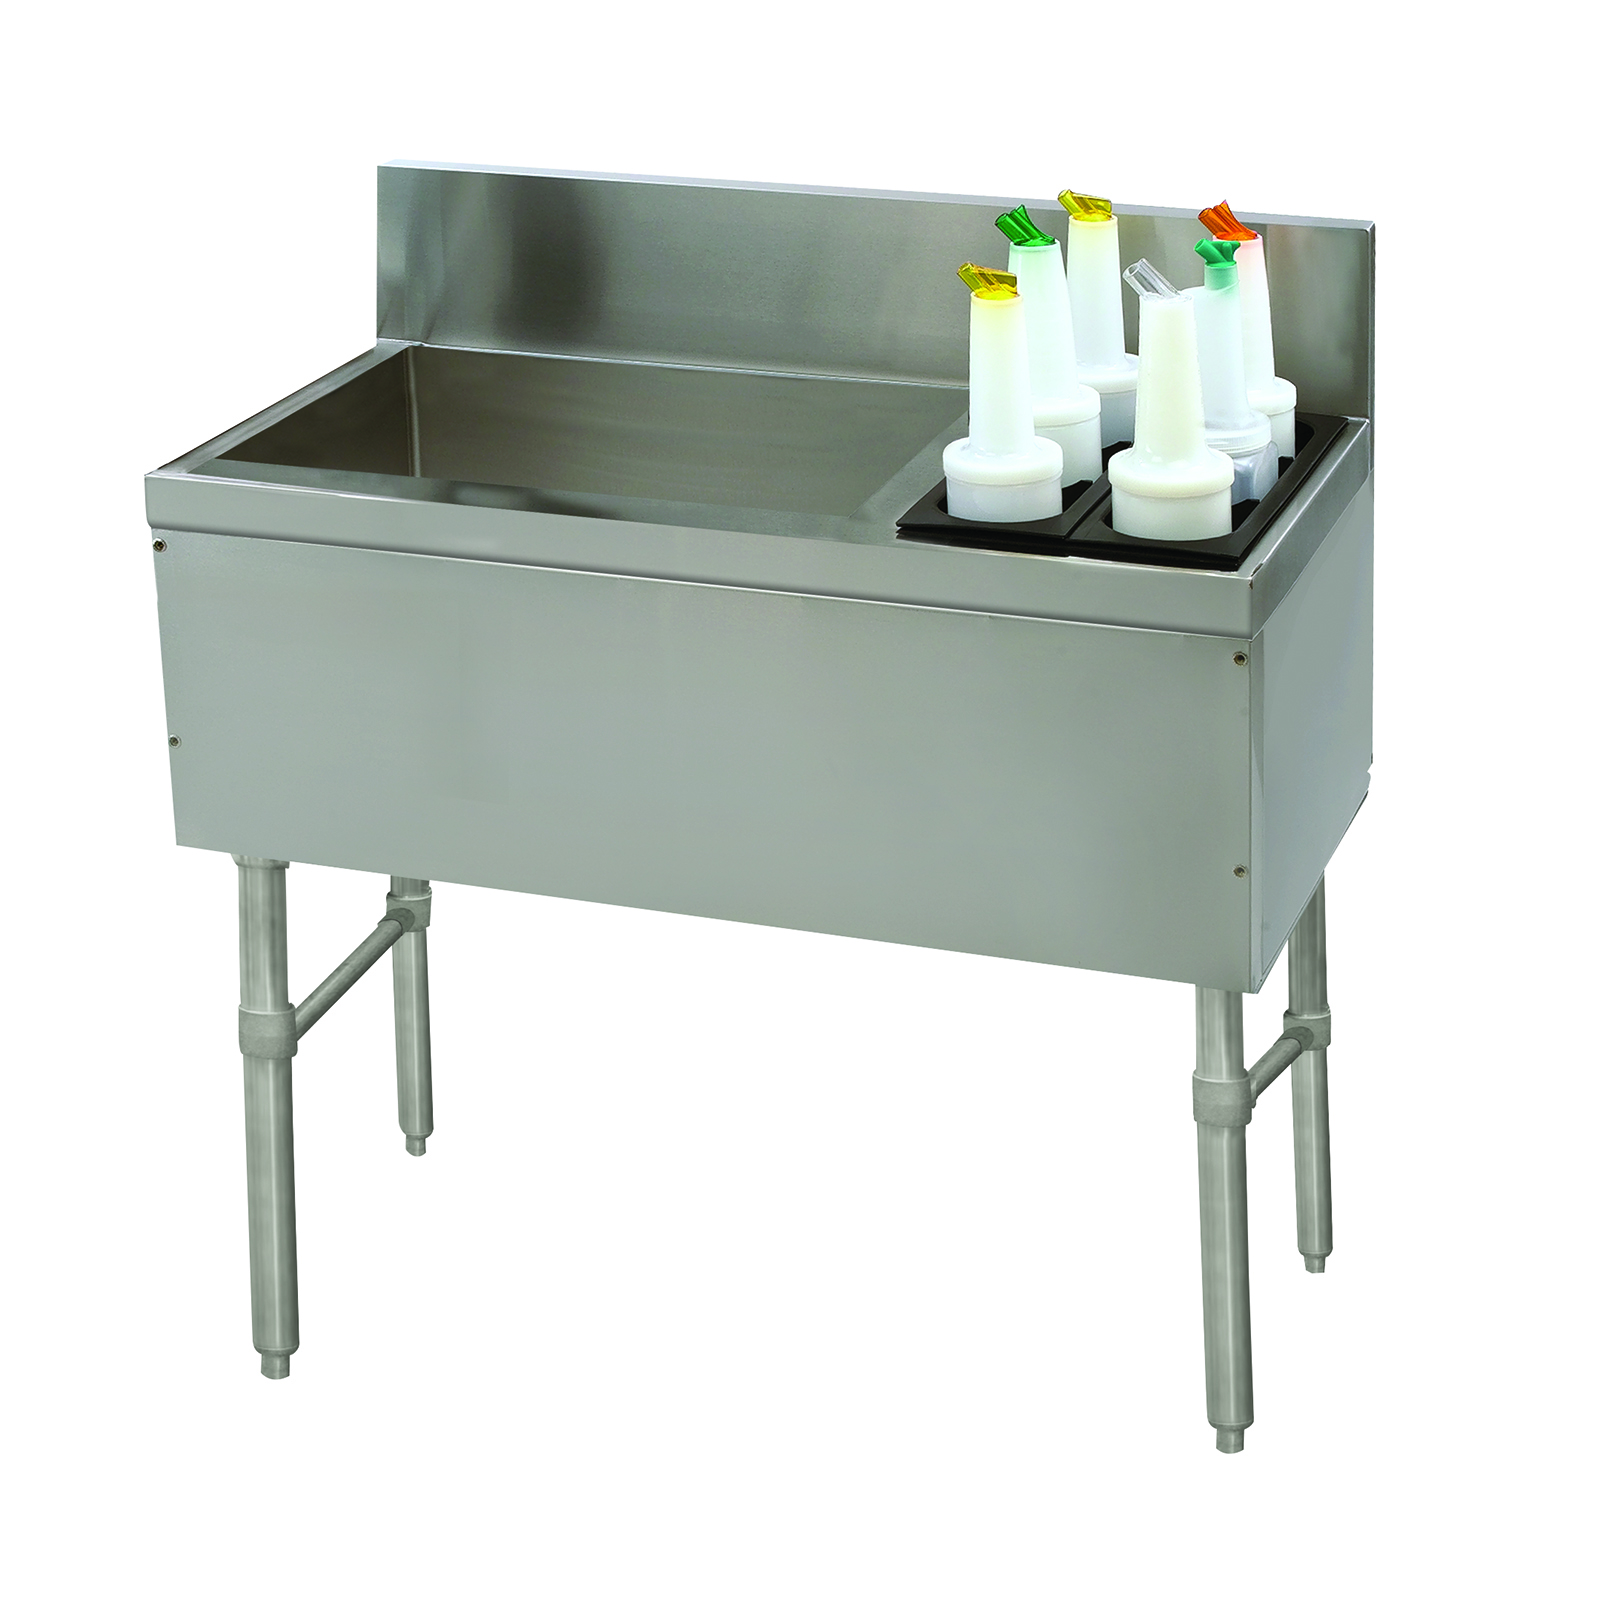 Advance Tabco PRC-19-42L underbar ice bin/cocktail station, bottle well bin